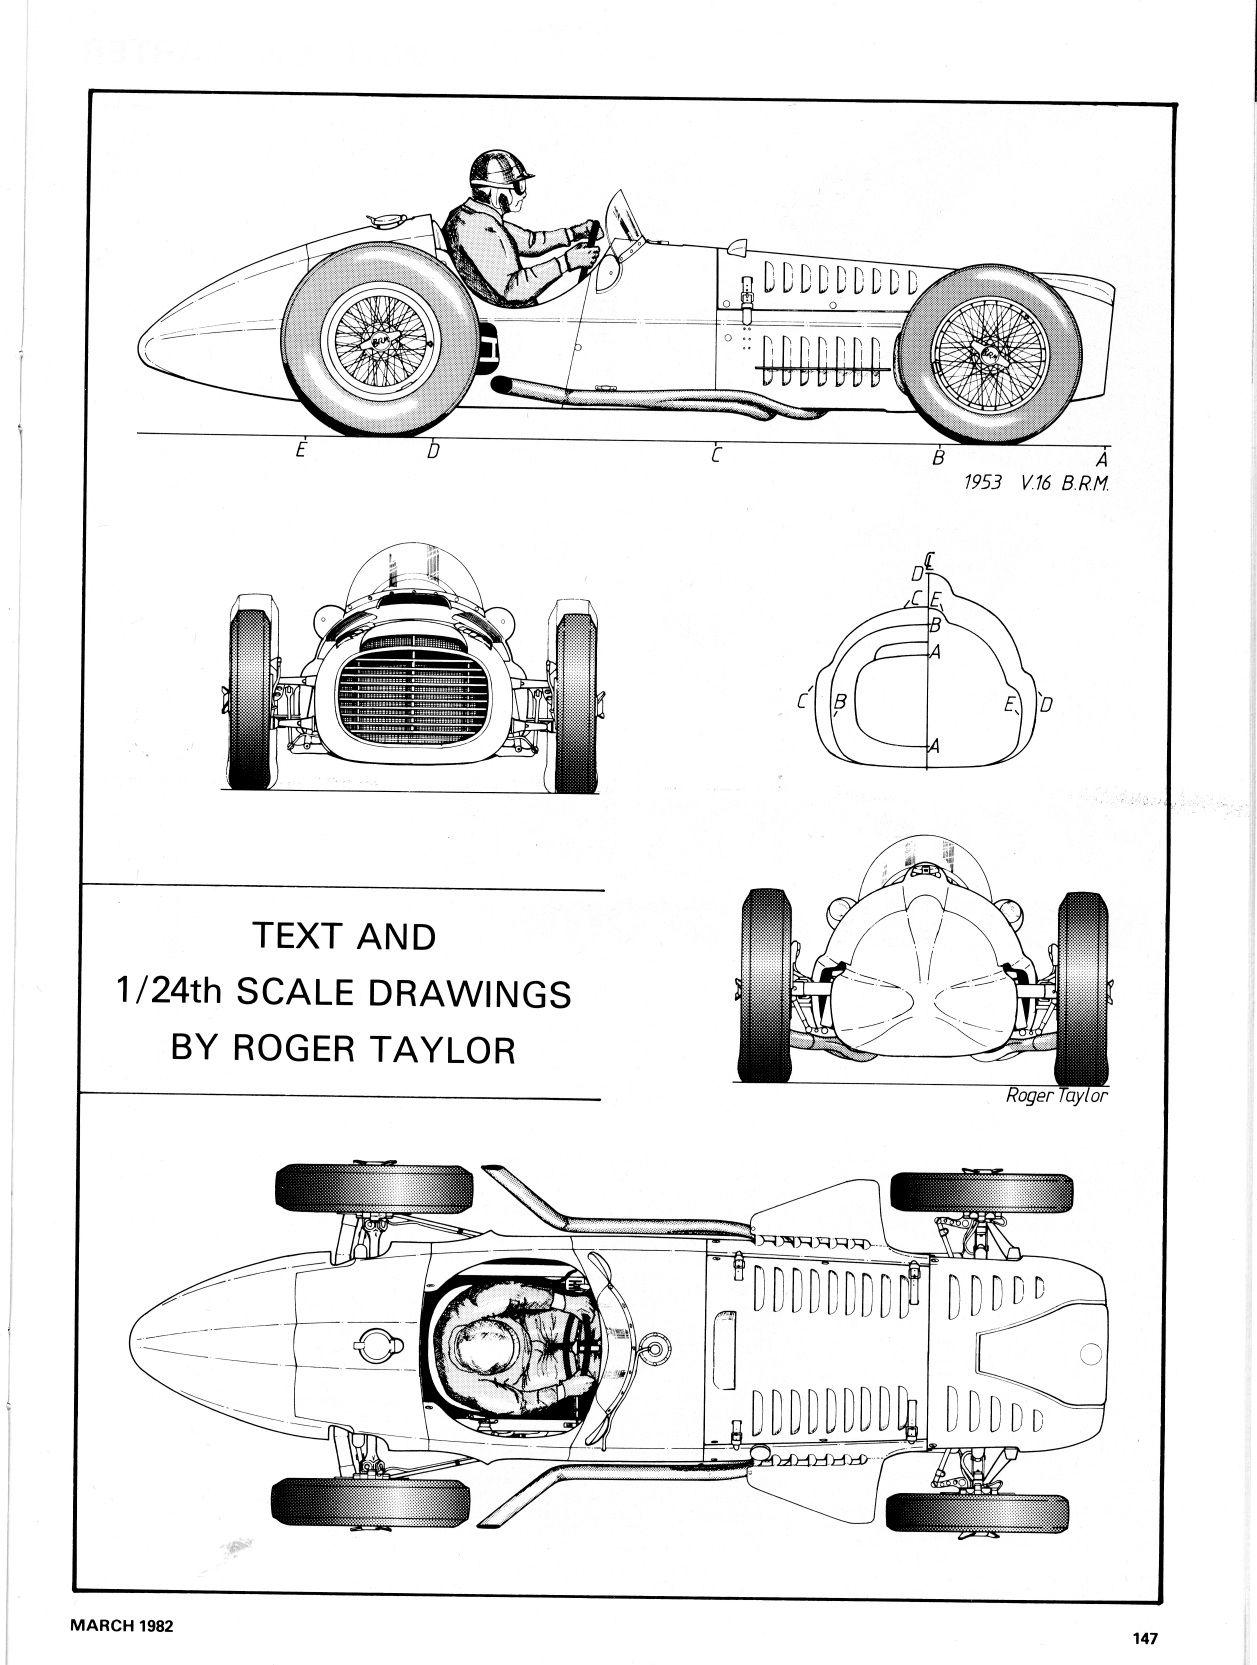 BRM V16 1953 F 1 Blueprint Pinterest